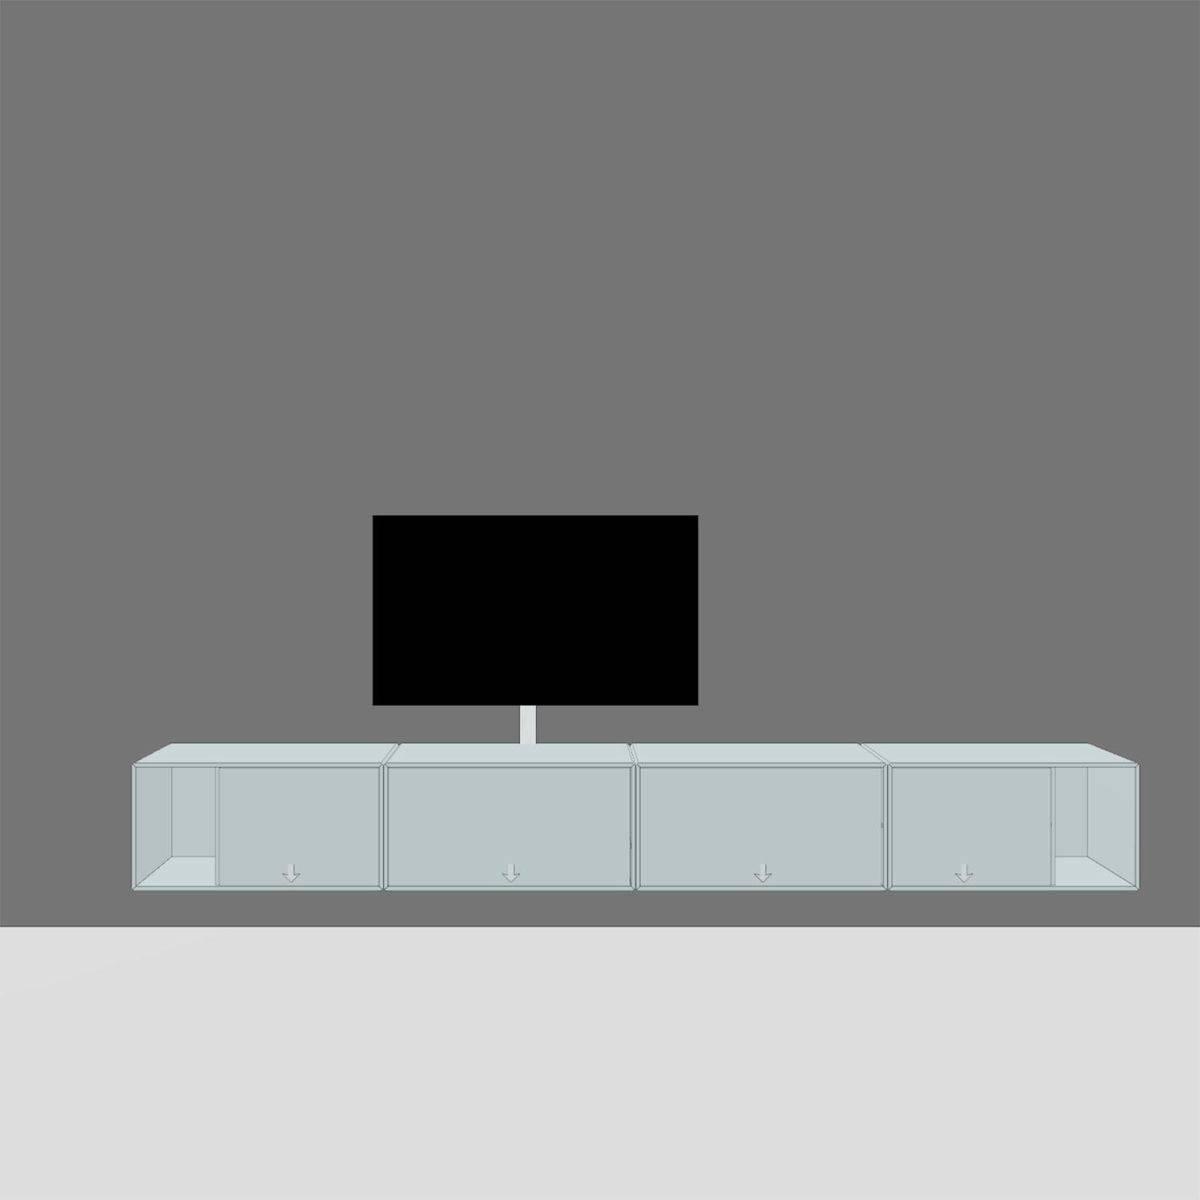 Montana Tv Hi-Fi Lowboard | Montana | Ambientedirect with Montana Sideboards (Image 6 of 15)